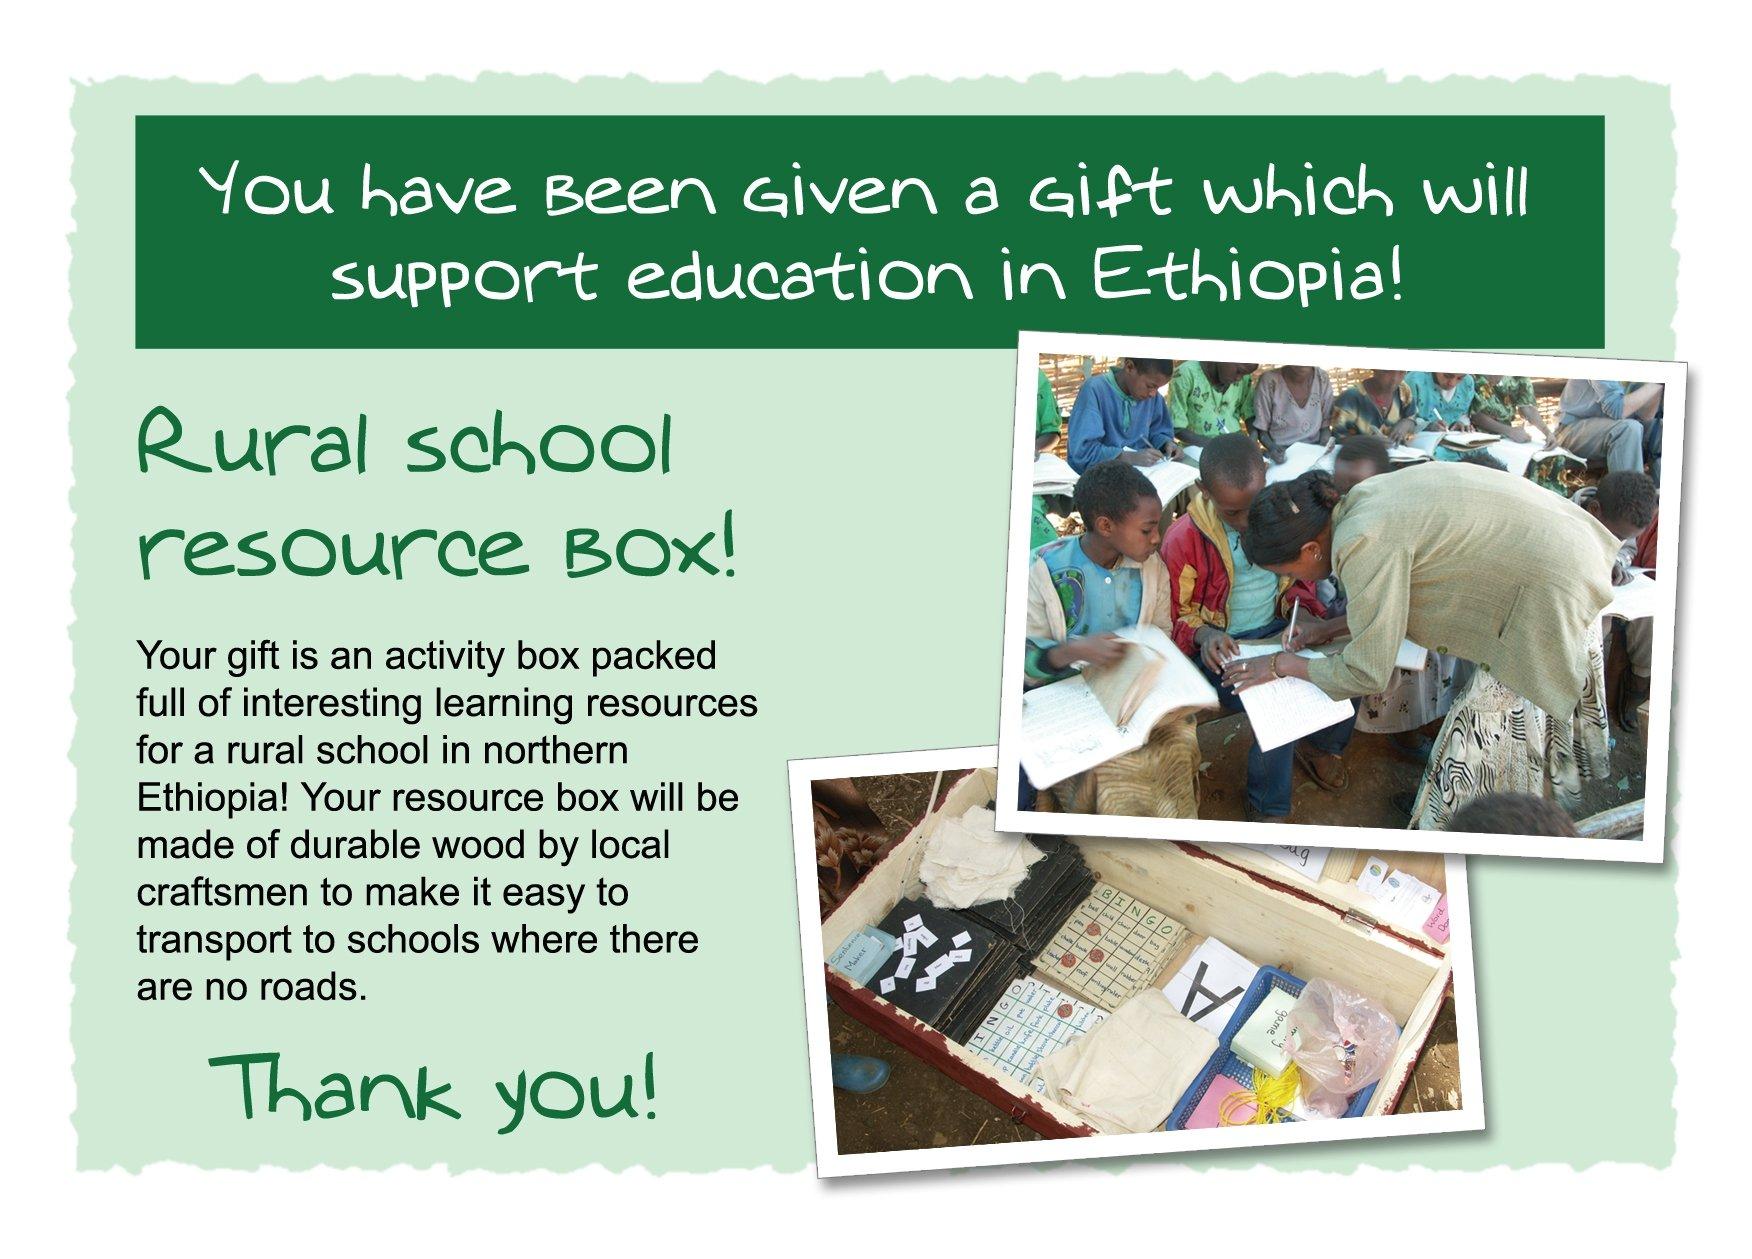 Rural School Resource Box